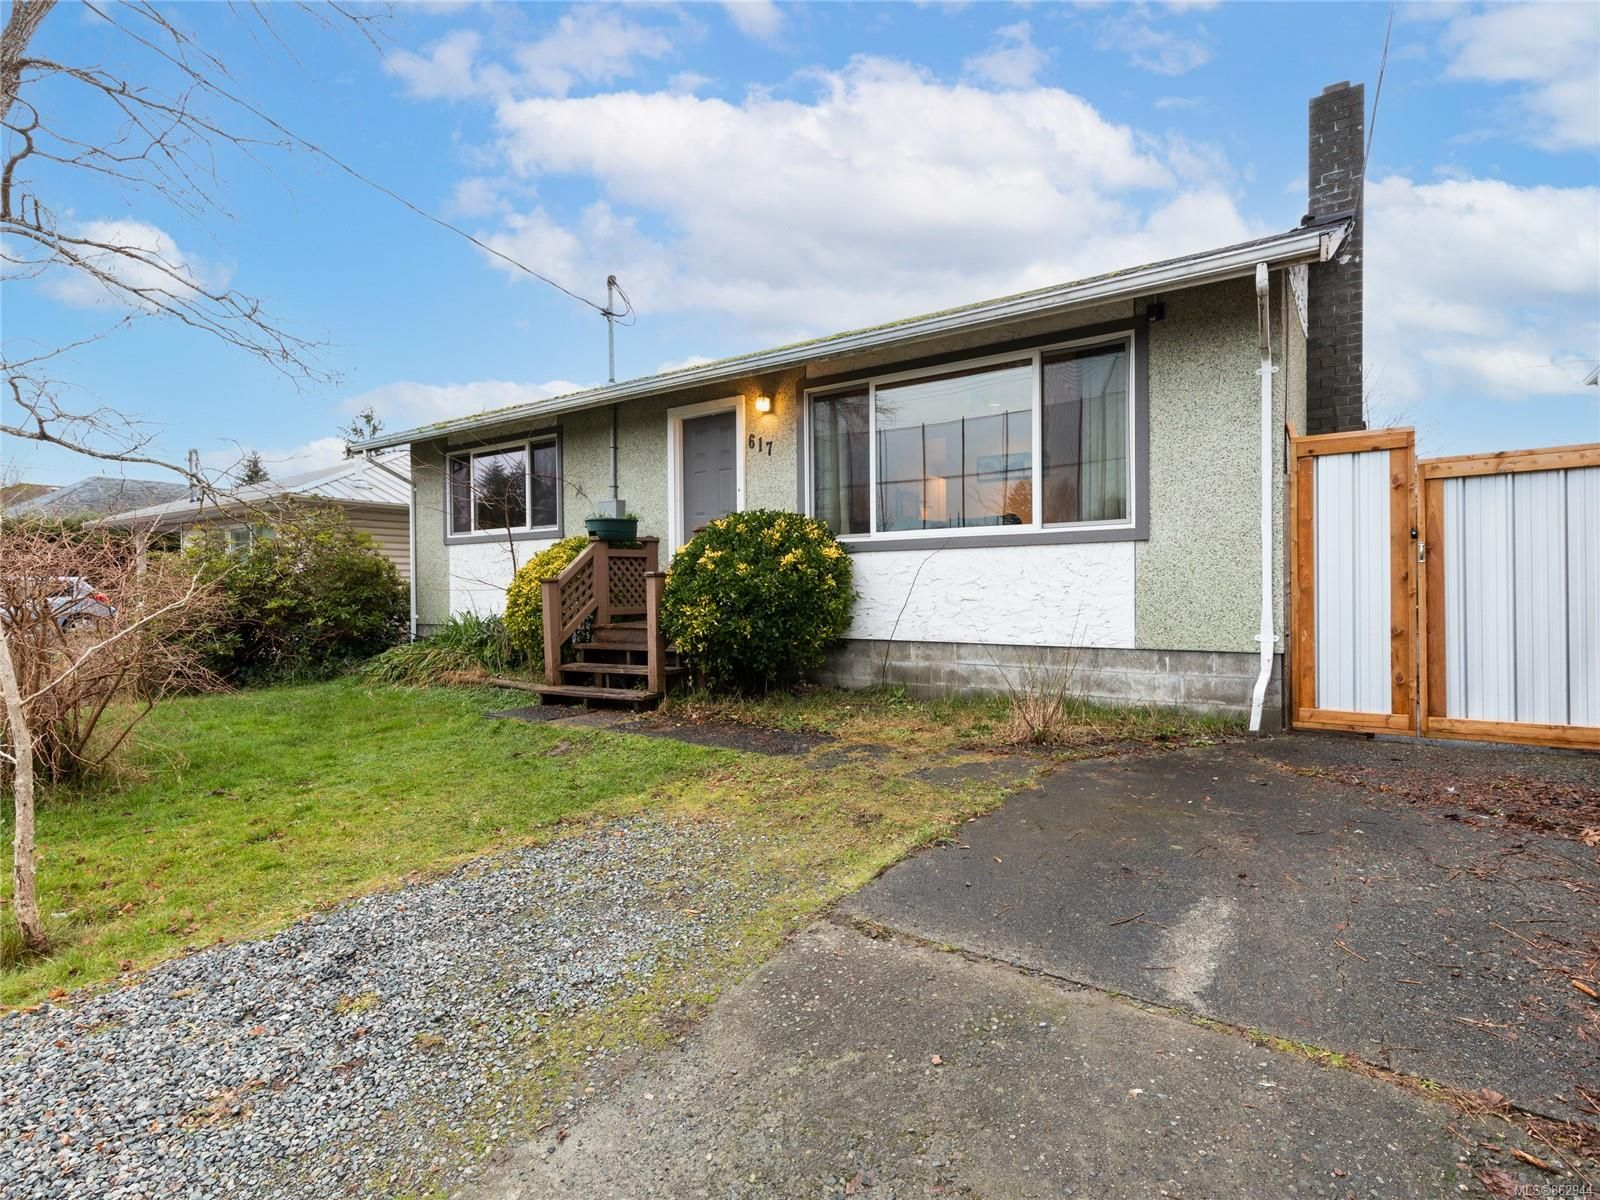 Main Photo: 617 Park Ave in : Na South Nanaimo House for sale (Nanaimo)  : MLS®# 862944